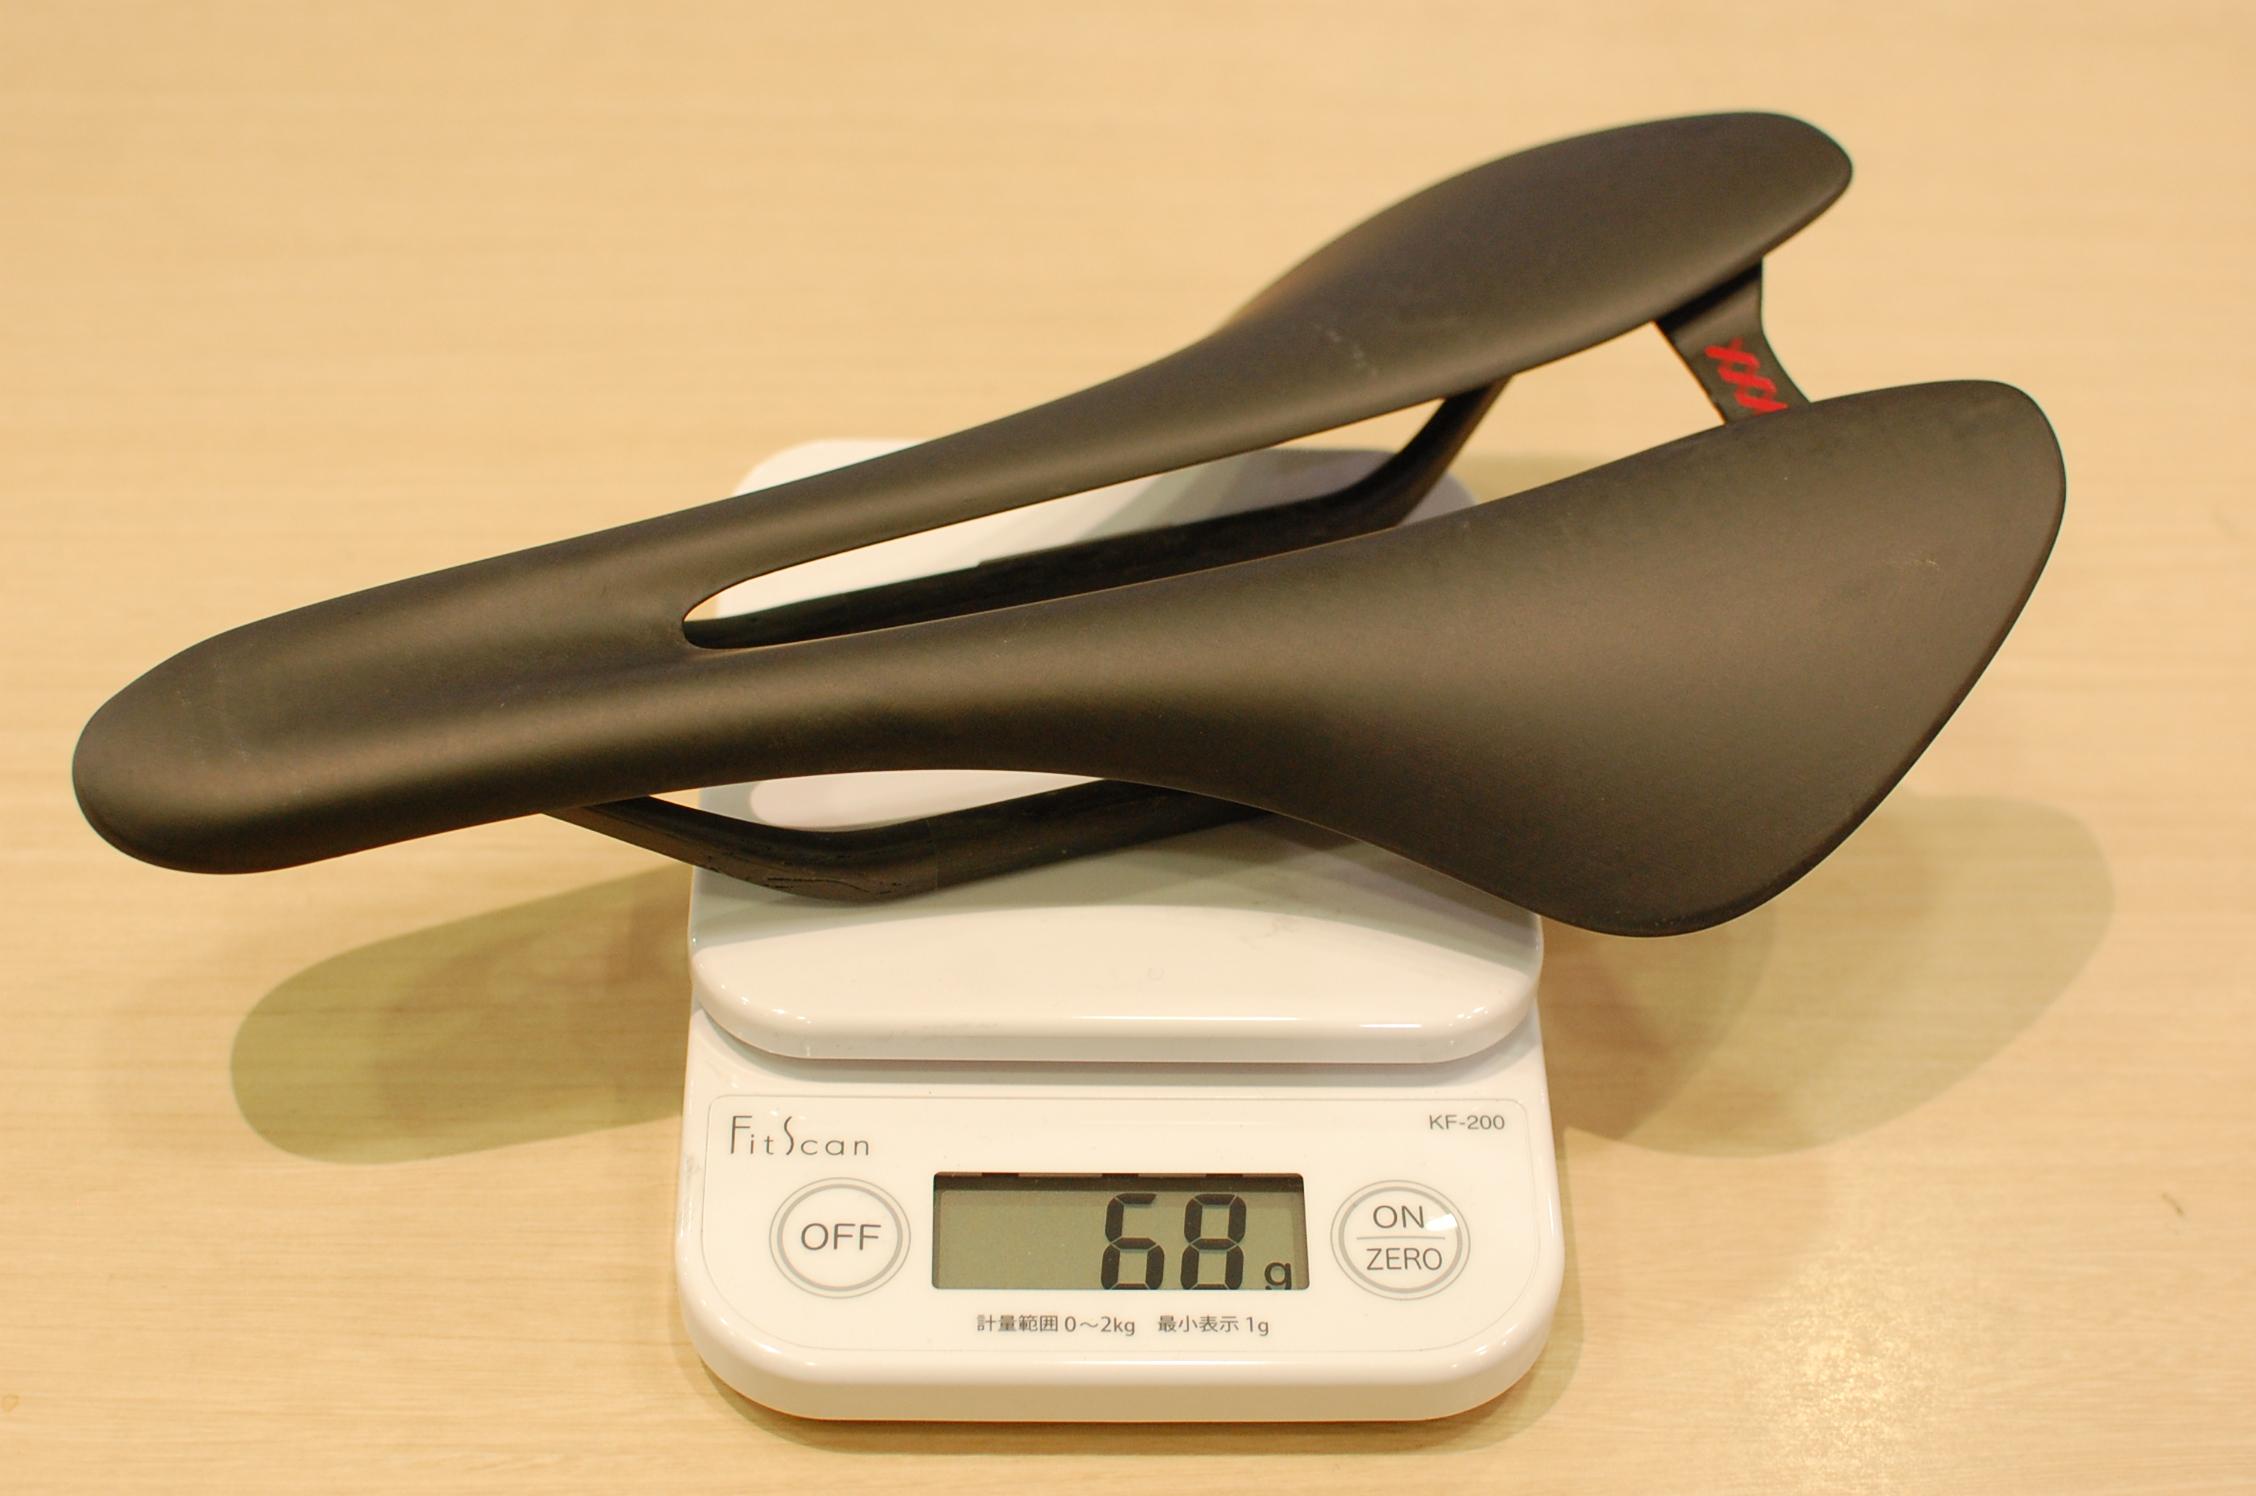 68gの超軽量フルカーボンサドル XXX Carbon Saddle店頭在庫あります!